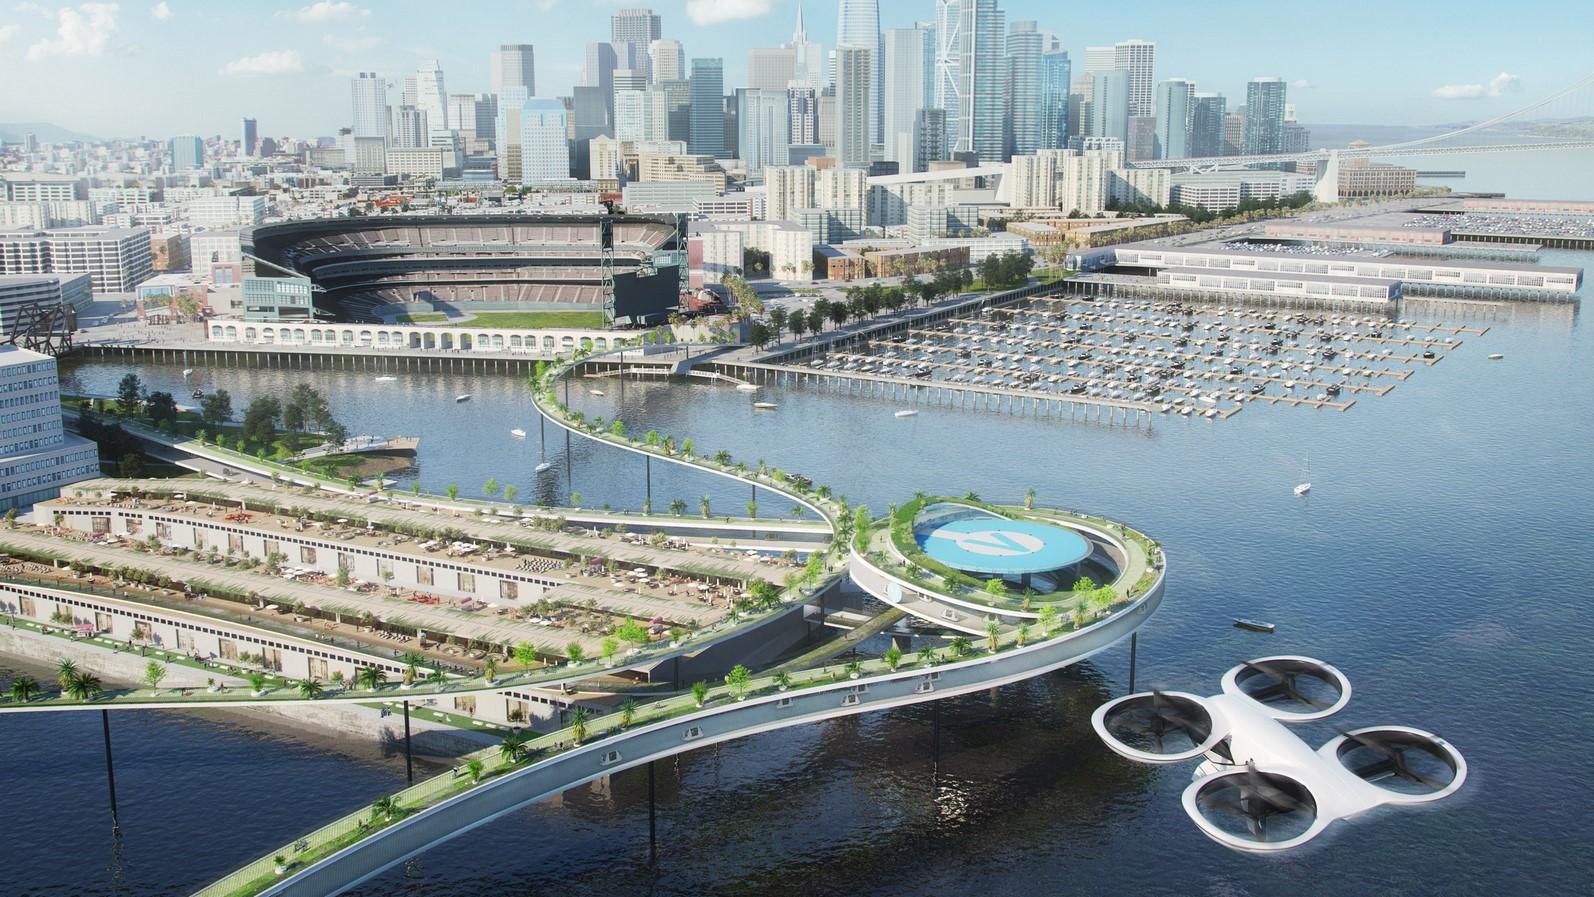 20 Futuristic projects in transportation design - Sheet7